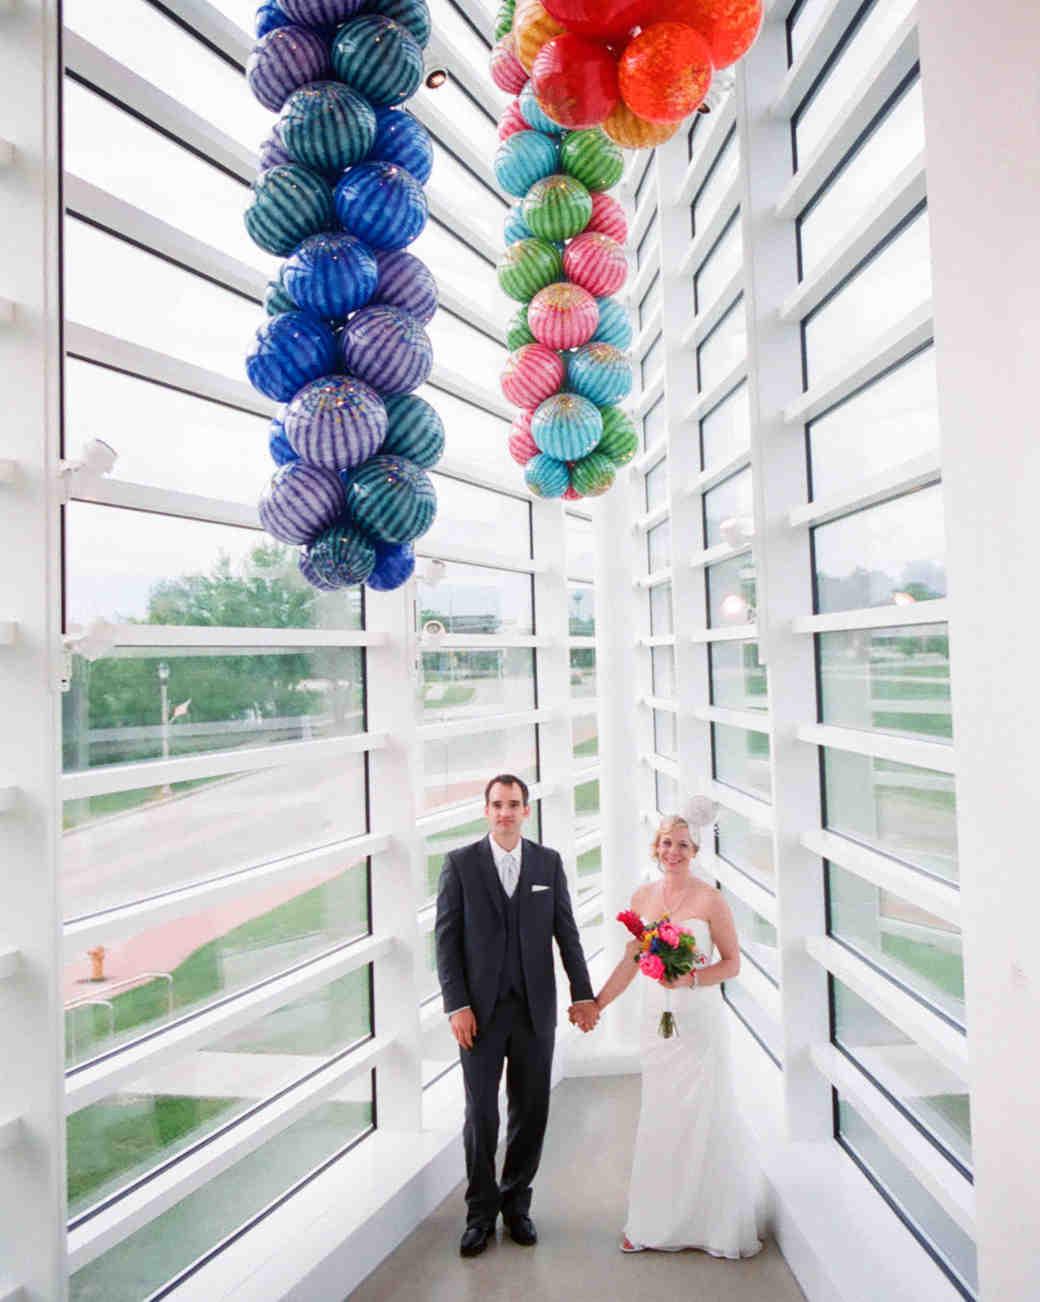 liz-jeff-wedding-couple-845-s112303-1115.jpg